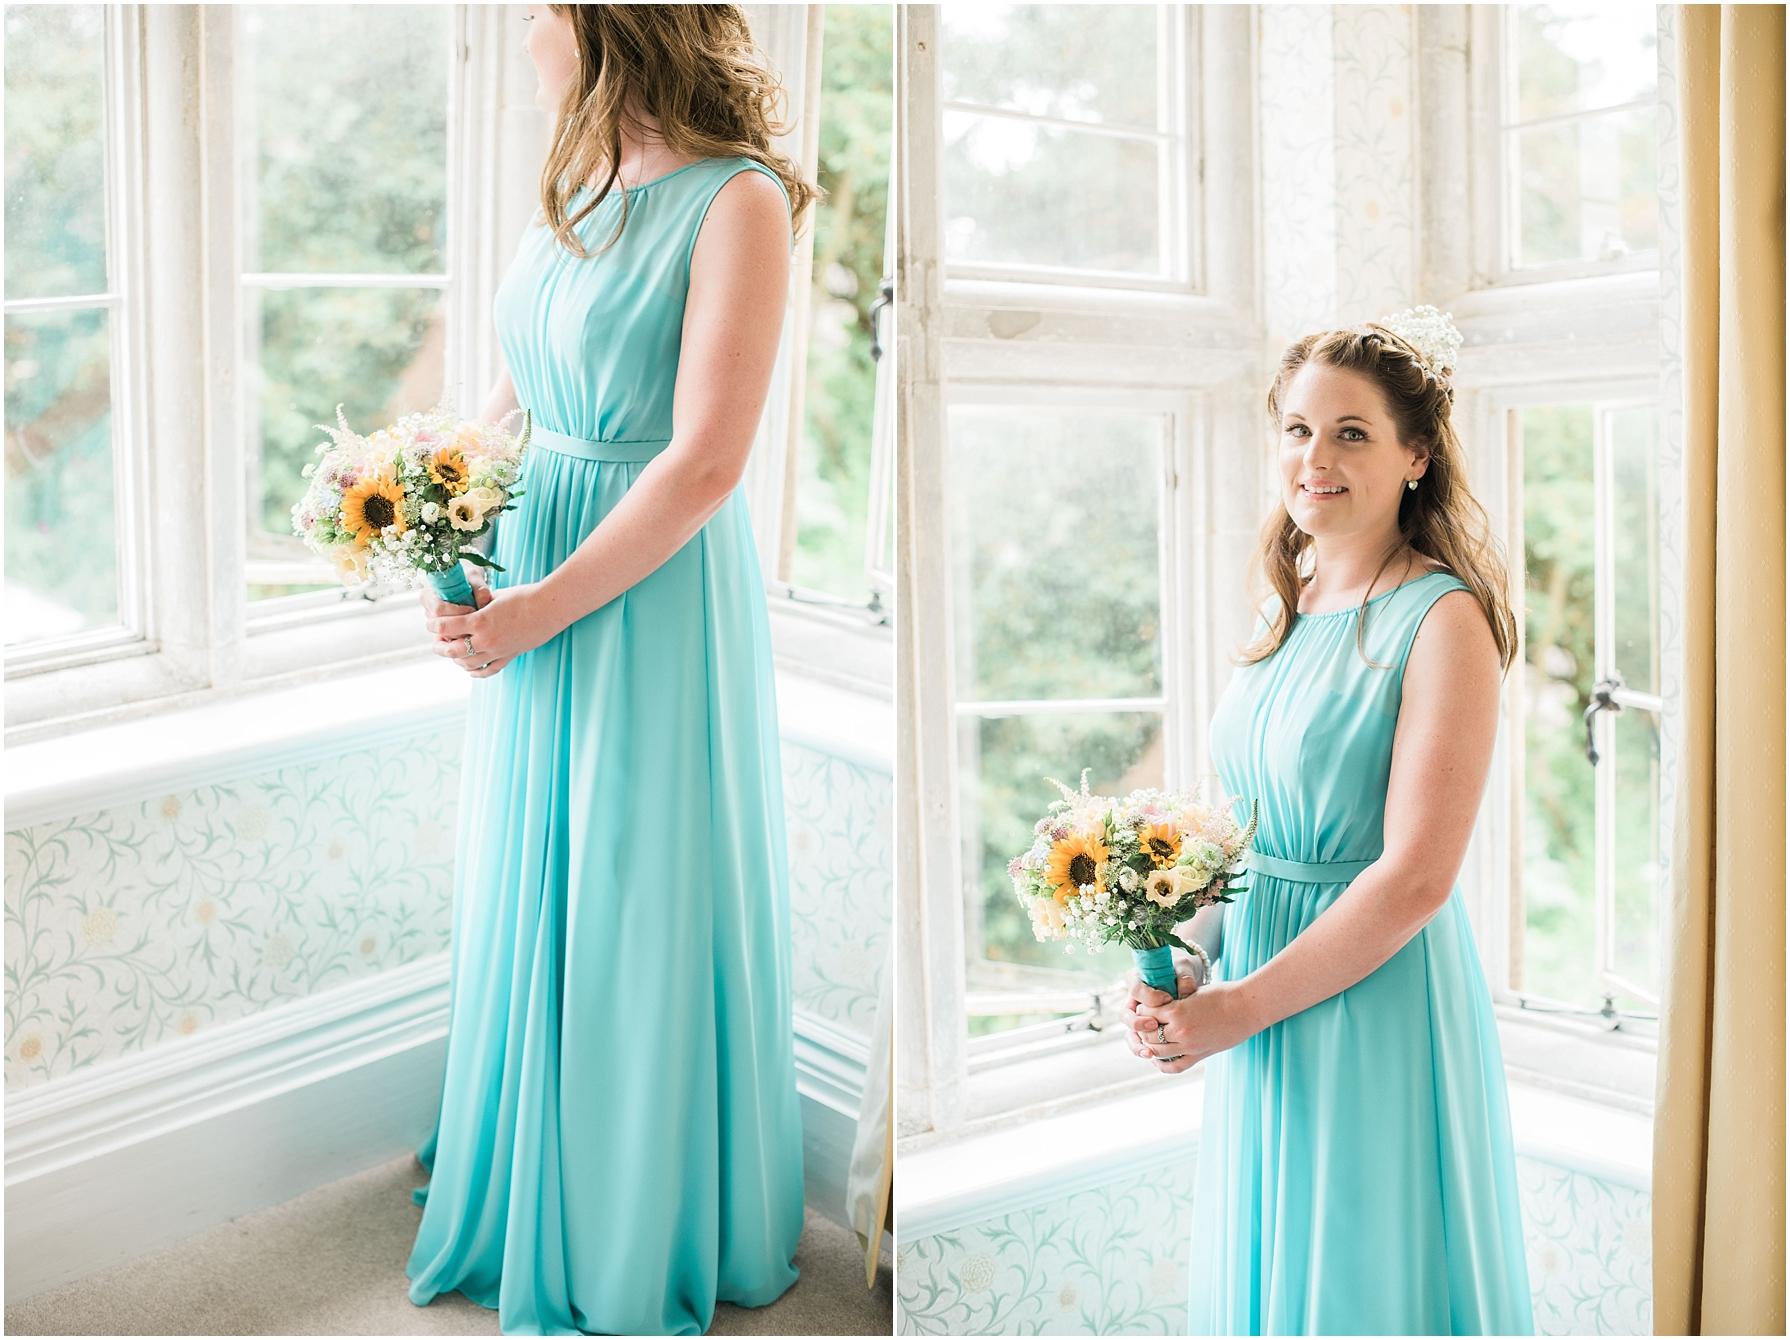 bridesmaid wearing a pastel green dress